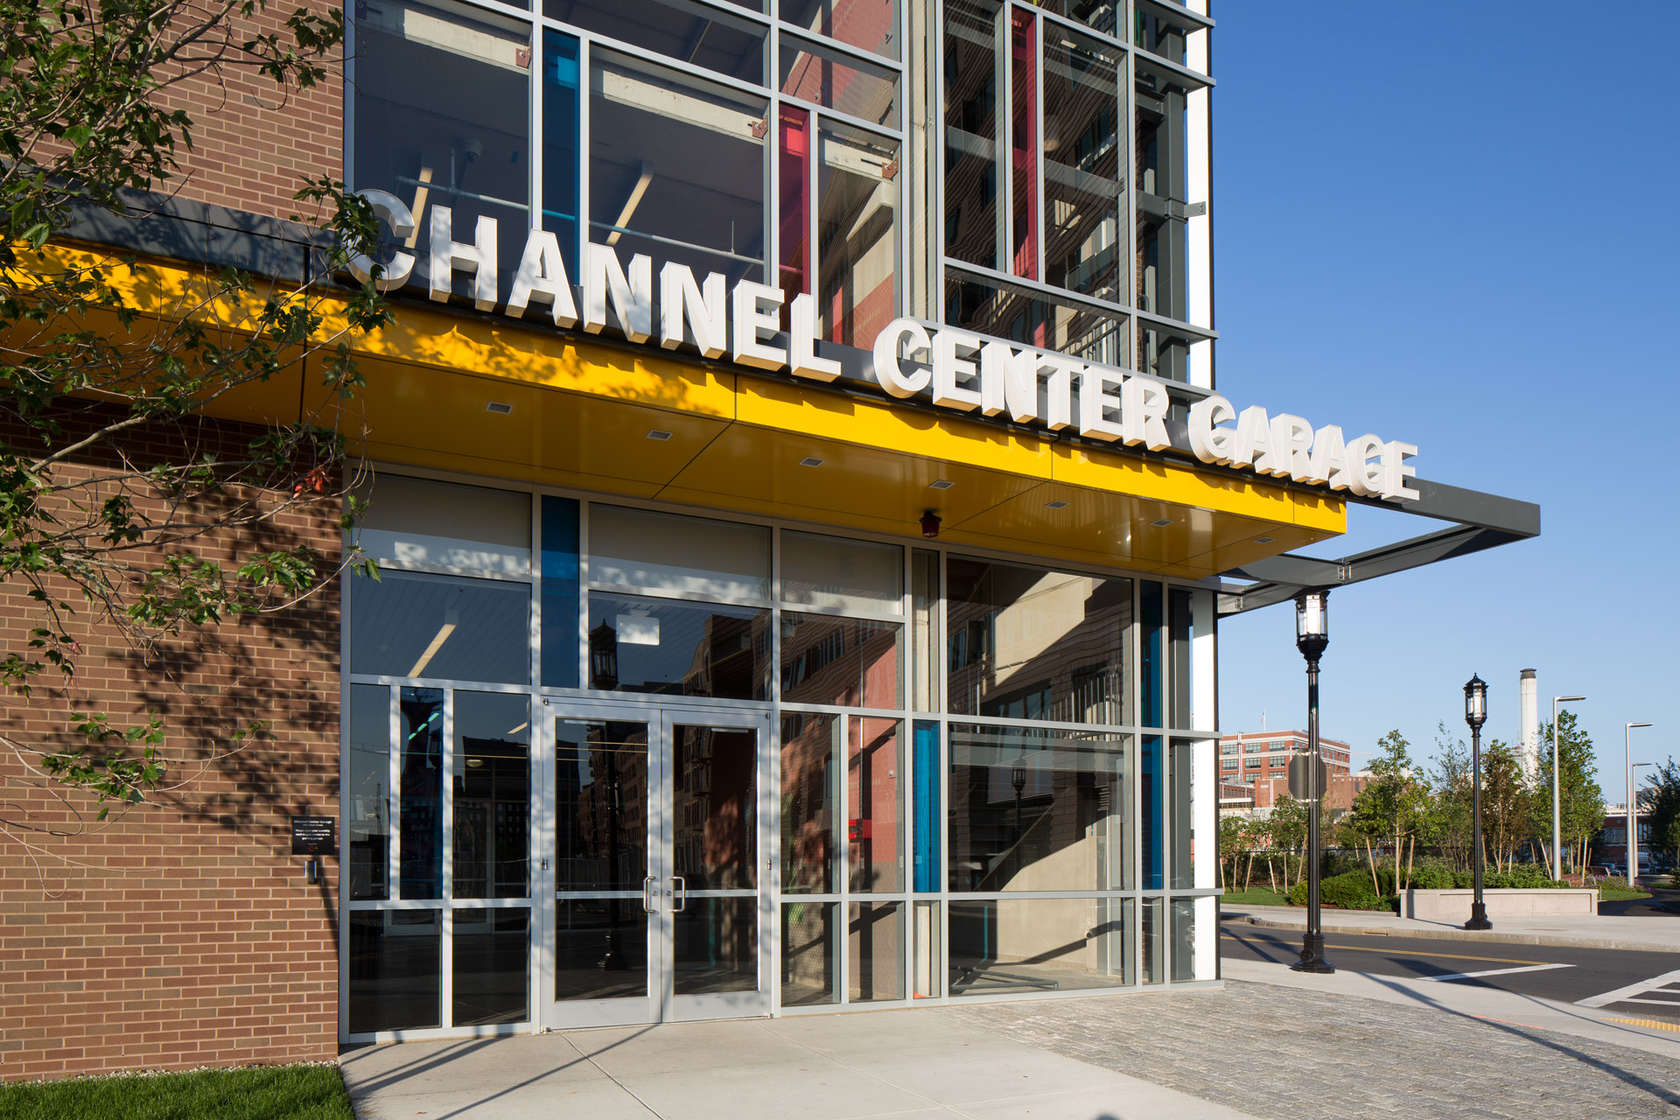 Channel center garage architizer for 166 terrace st boston ma